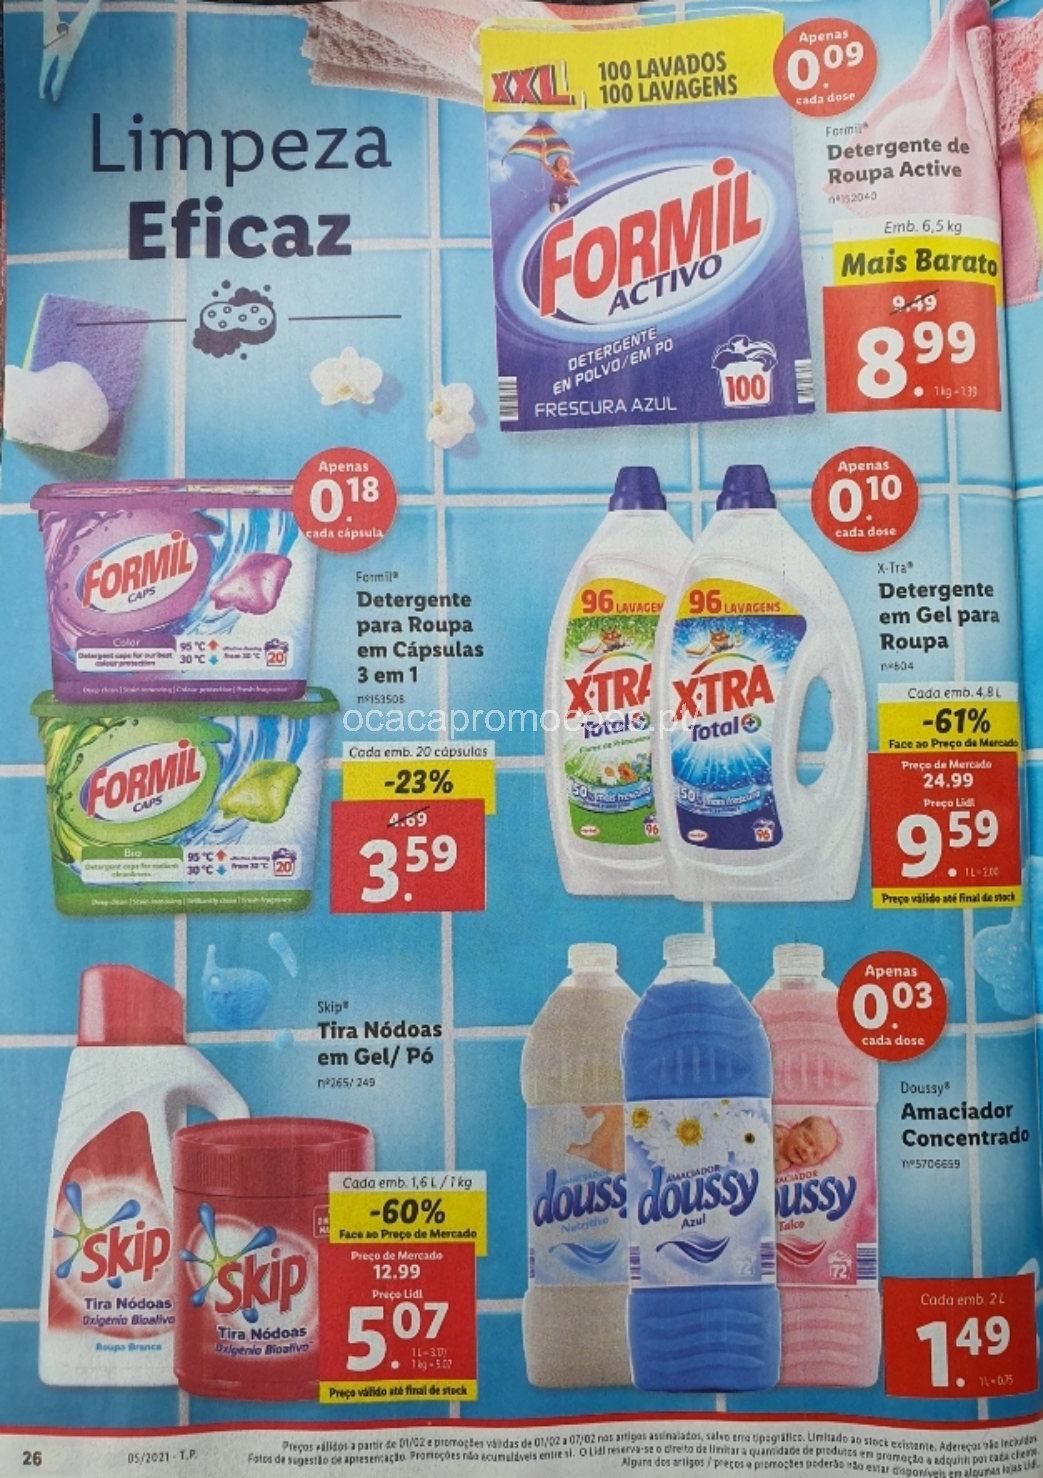 2 antevisao folheto bazar lidl promocoes Page13 26